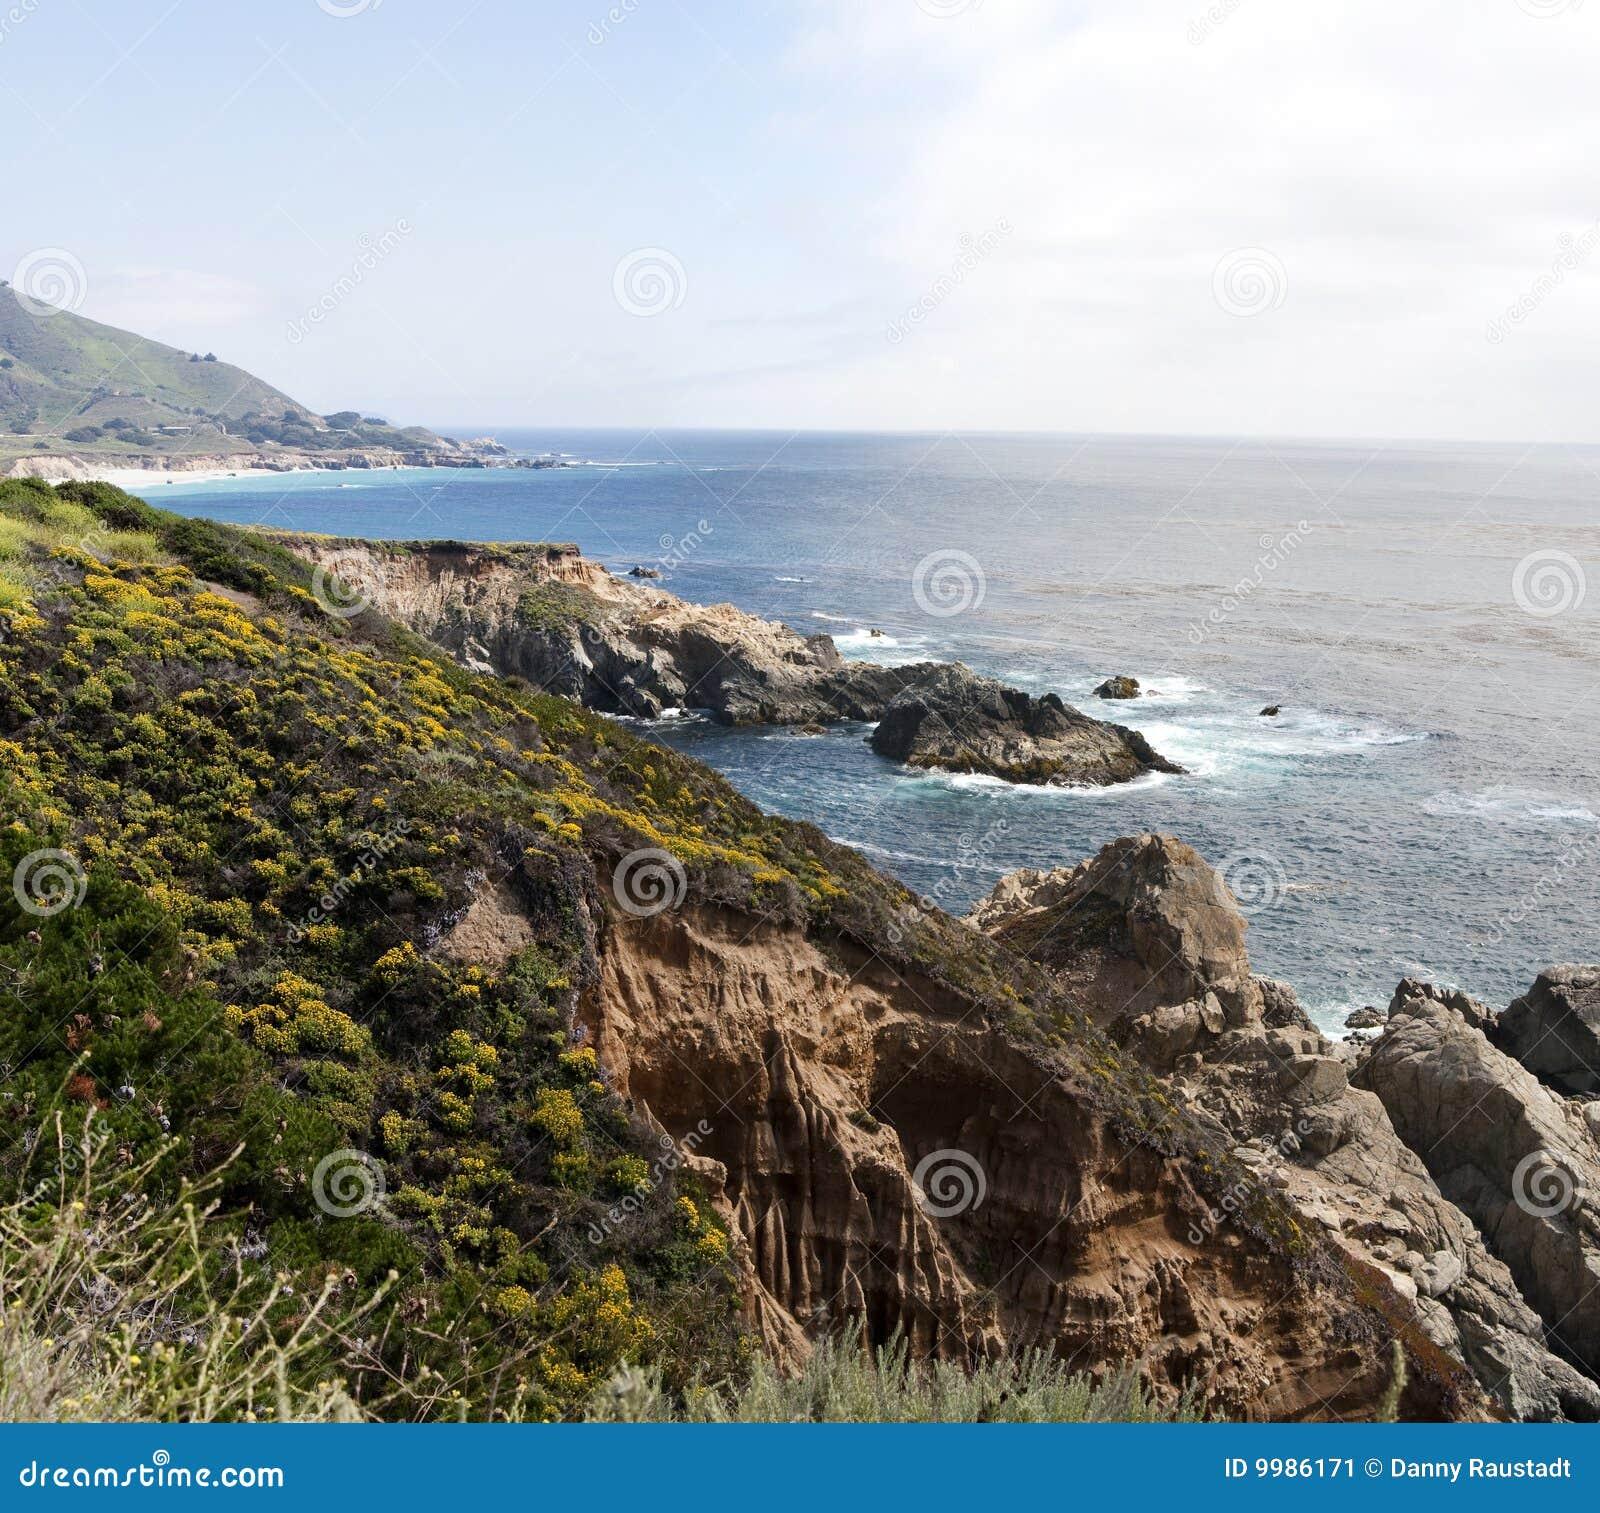 Southern California Pacific Ocean. Stock Photo - Image of ...  |Pacific Ocean California